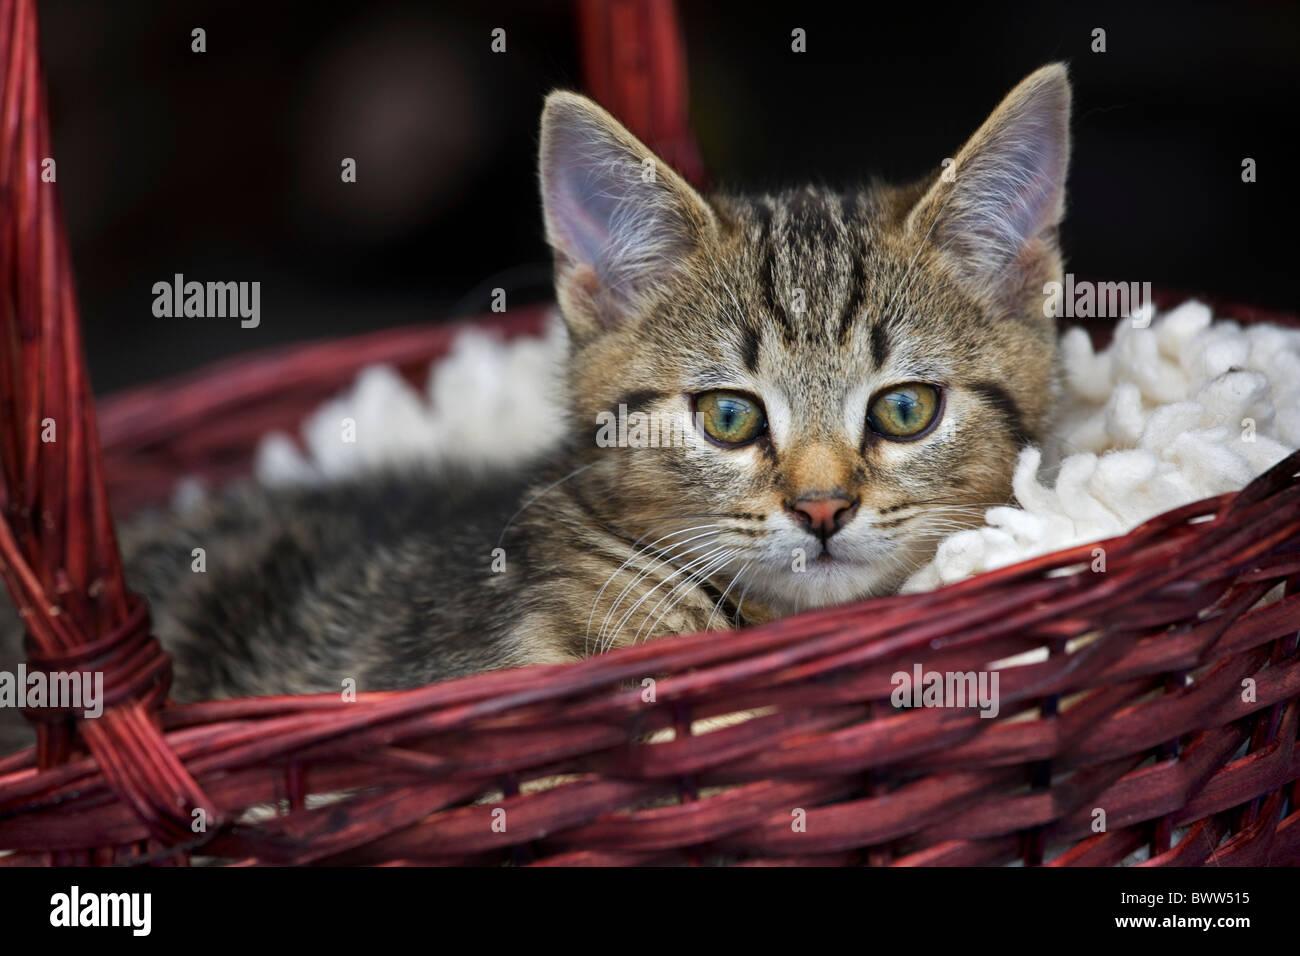 Domestic cat (Felis catus) resting in red basket - Stock Image